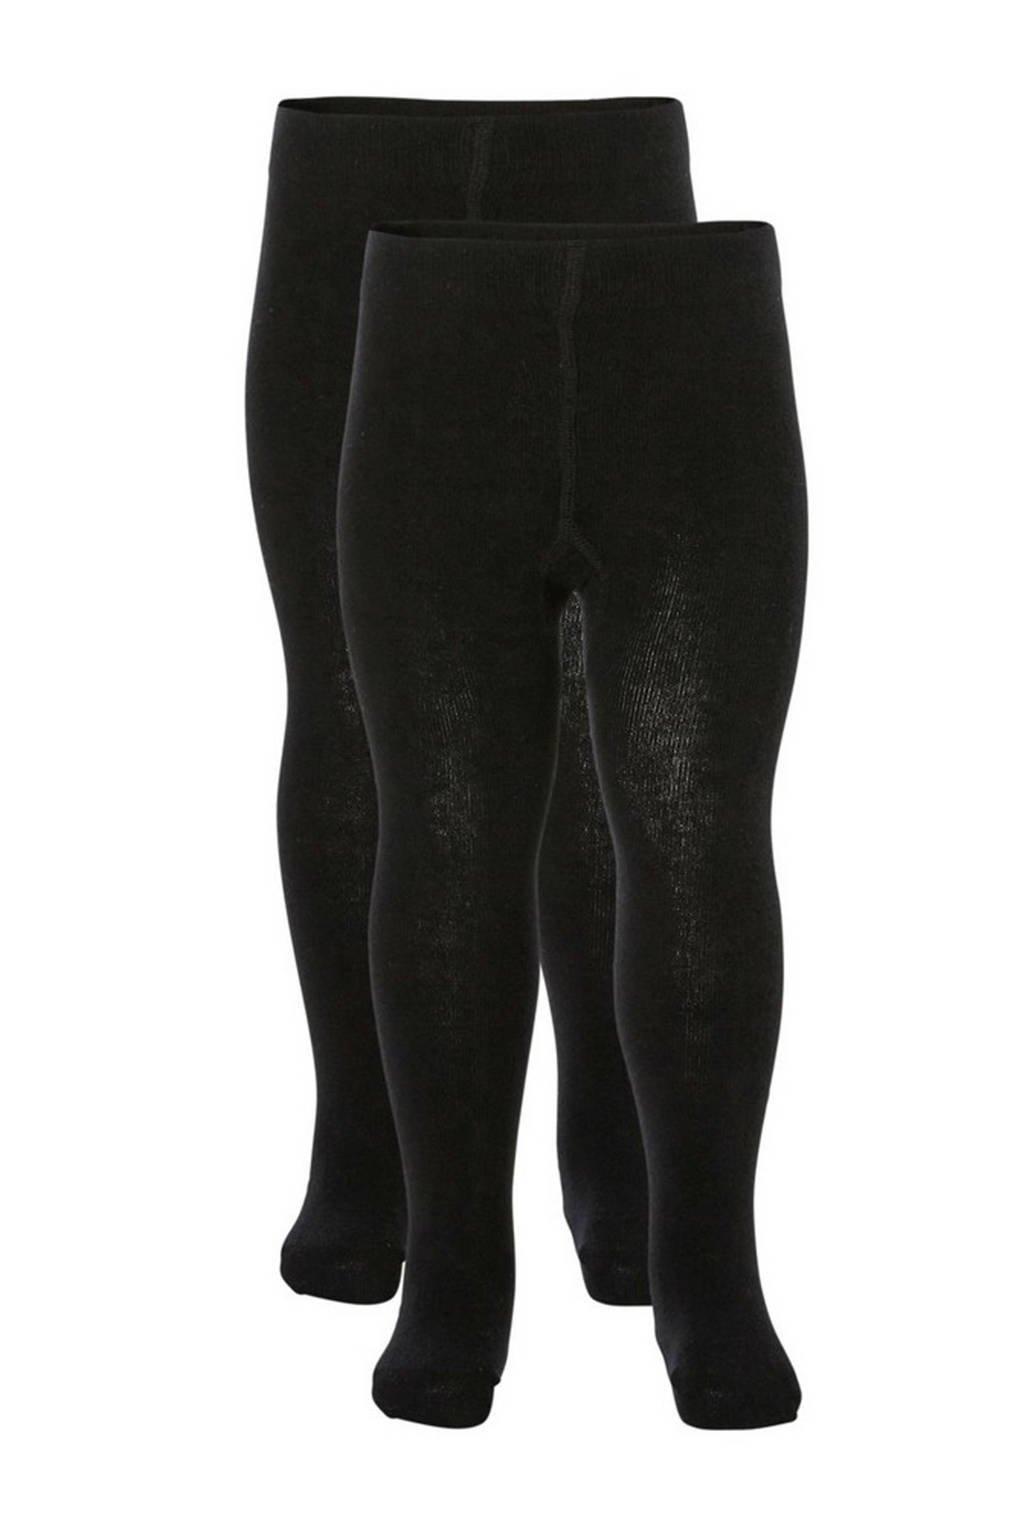 anytime maillot - set van 2 zwart, Zwart